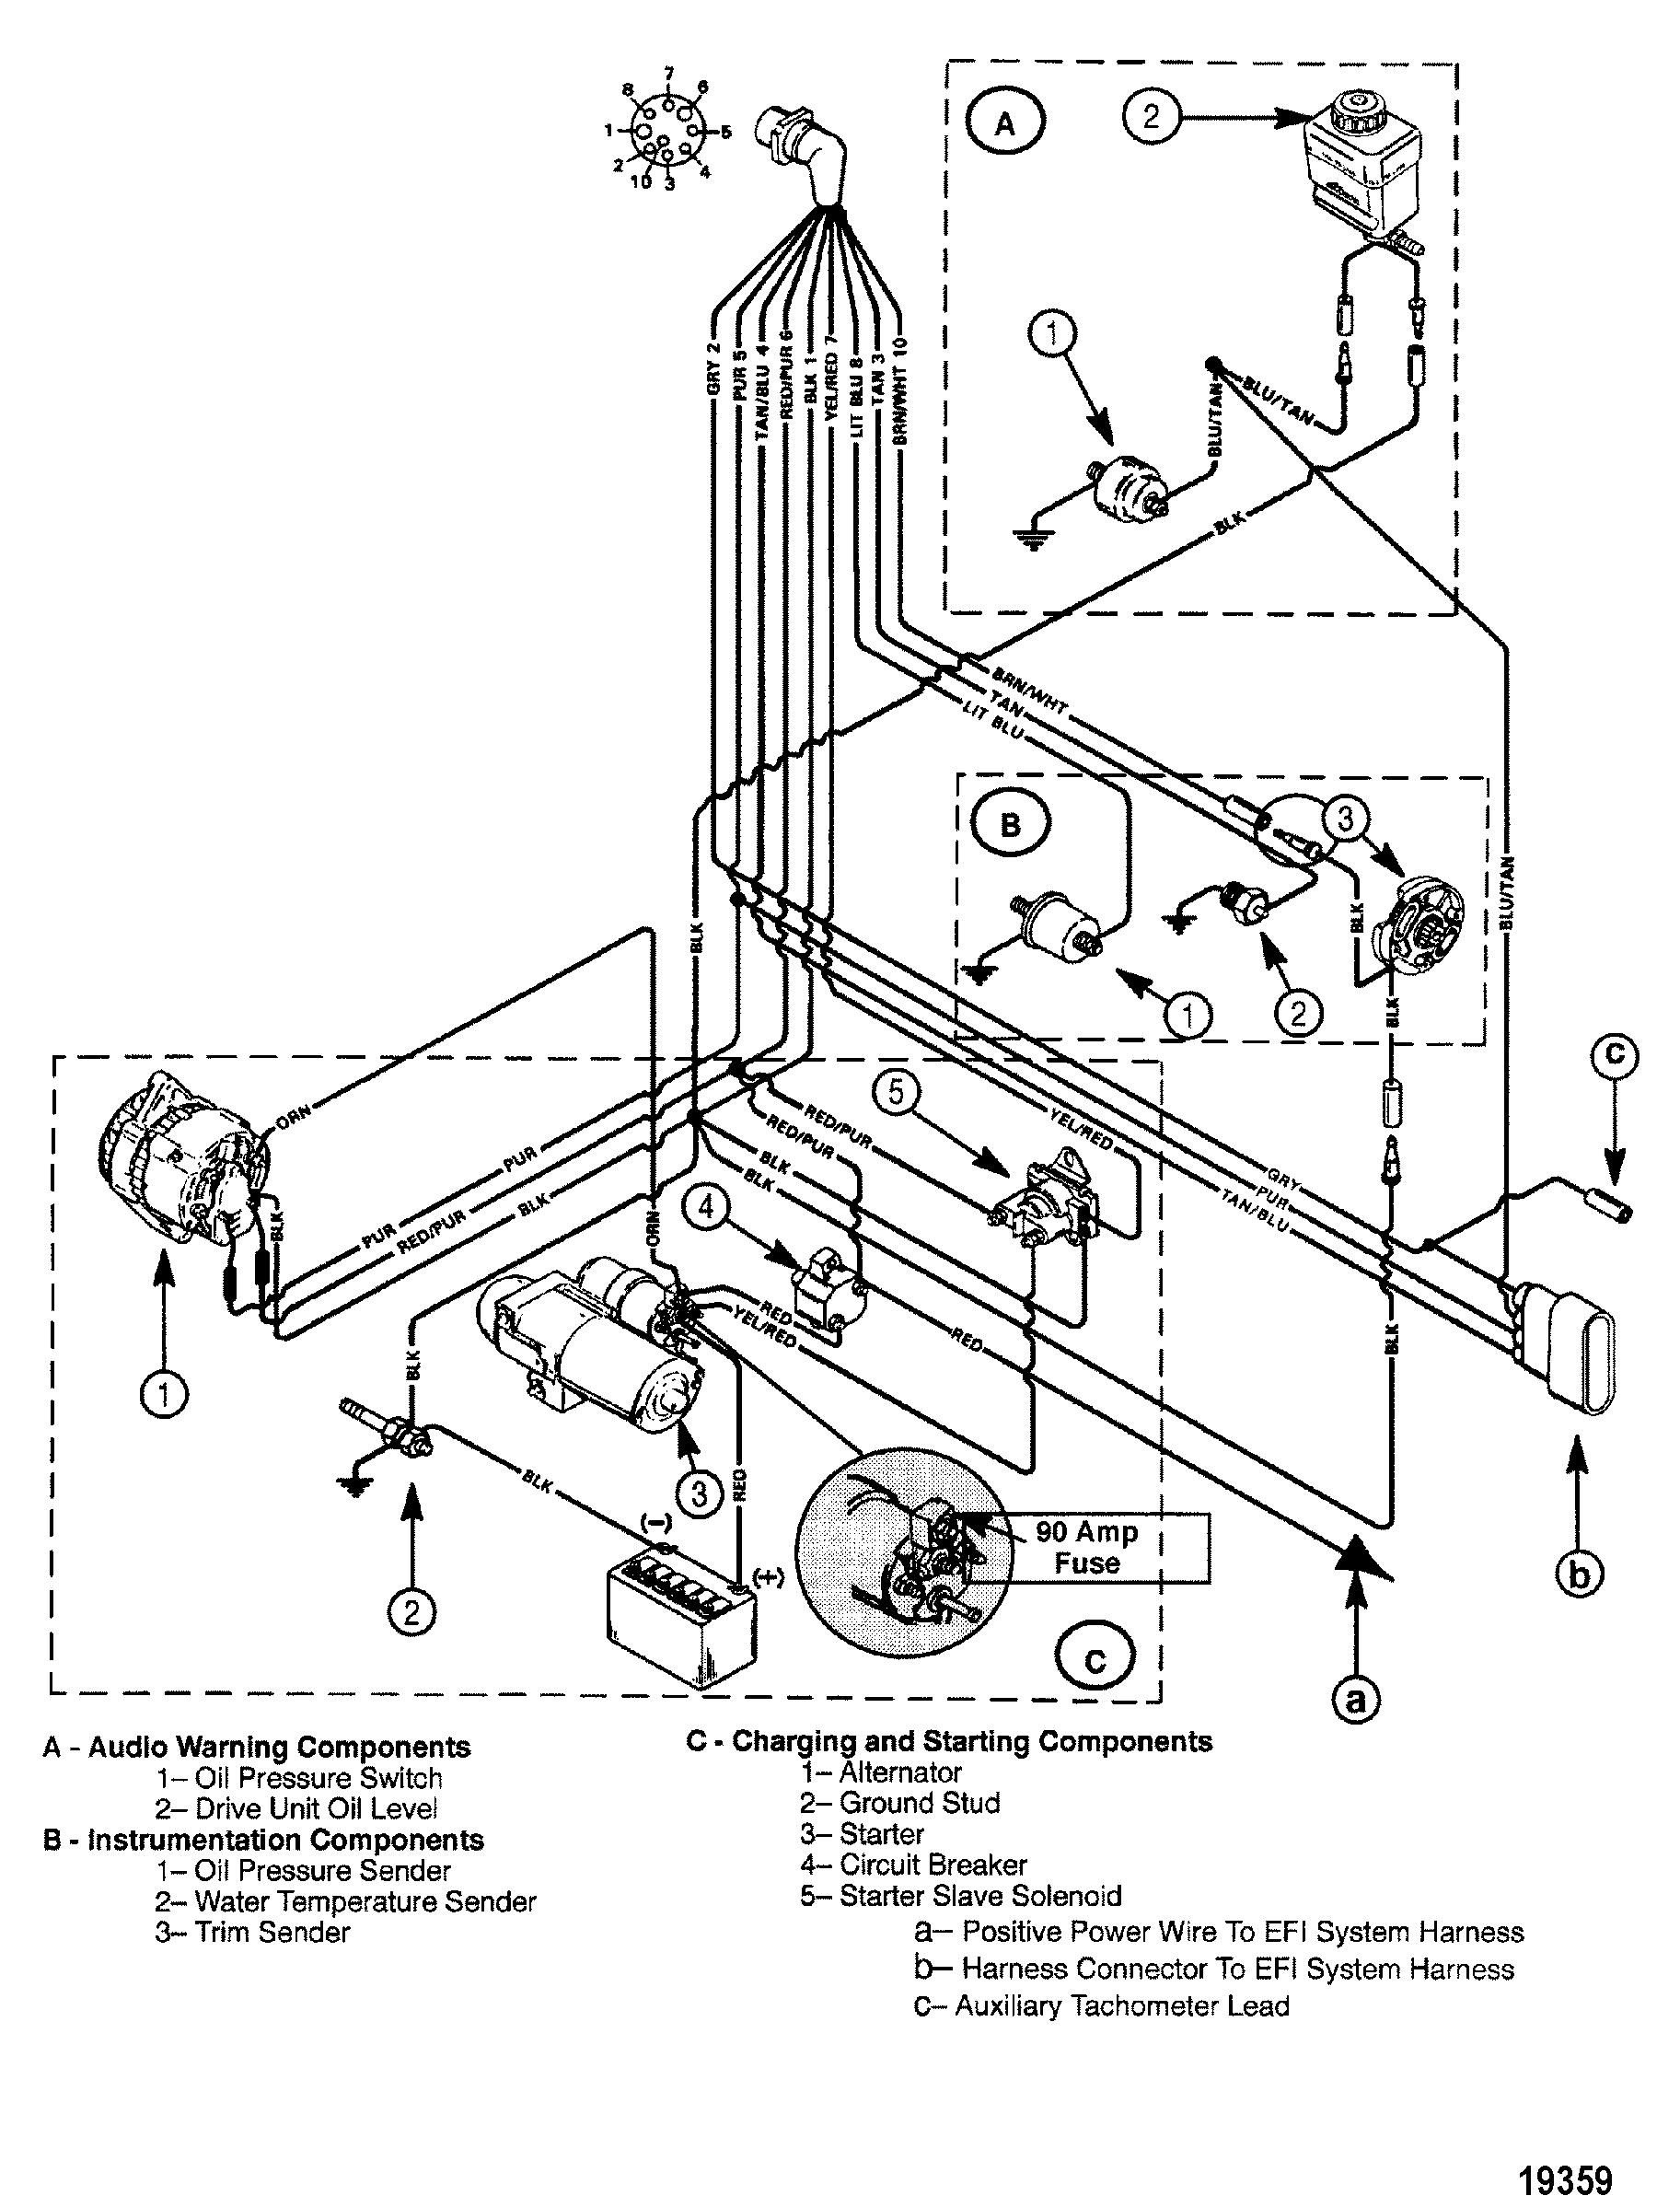 1987 mercruiser 350 ignition wiring diagram - wiring diagram system  bald-norm - bald-norm.ediliadesign.it  ediliadesign.it